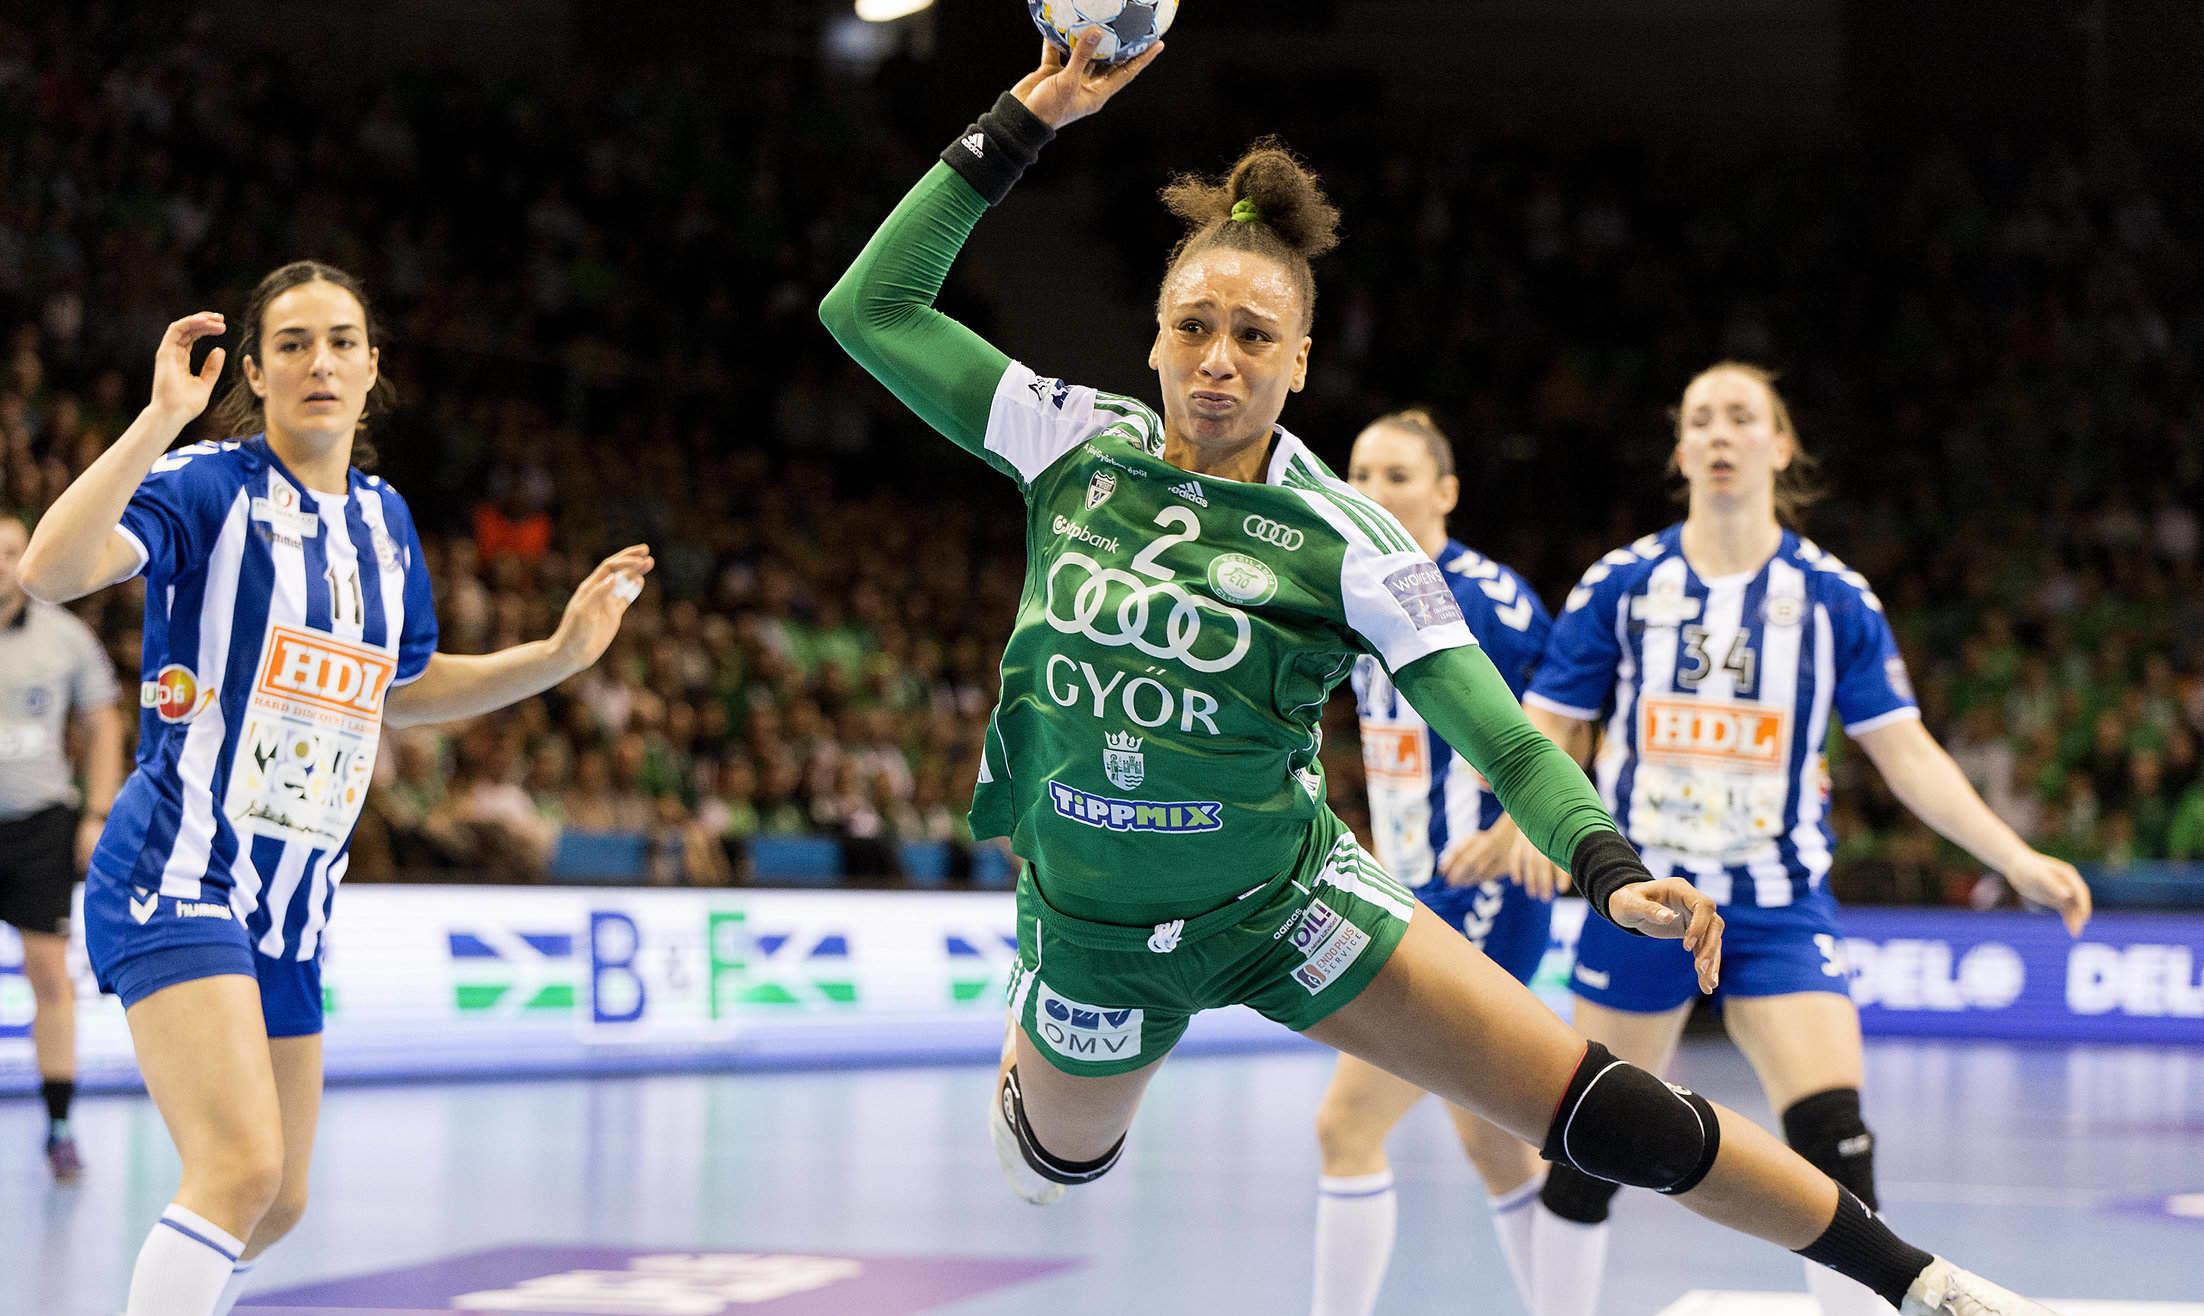 handball competition